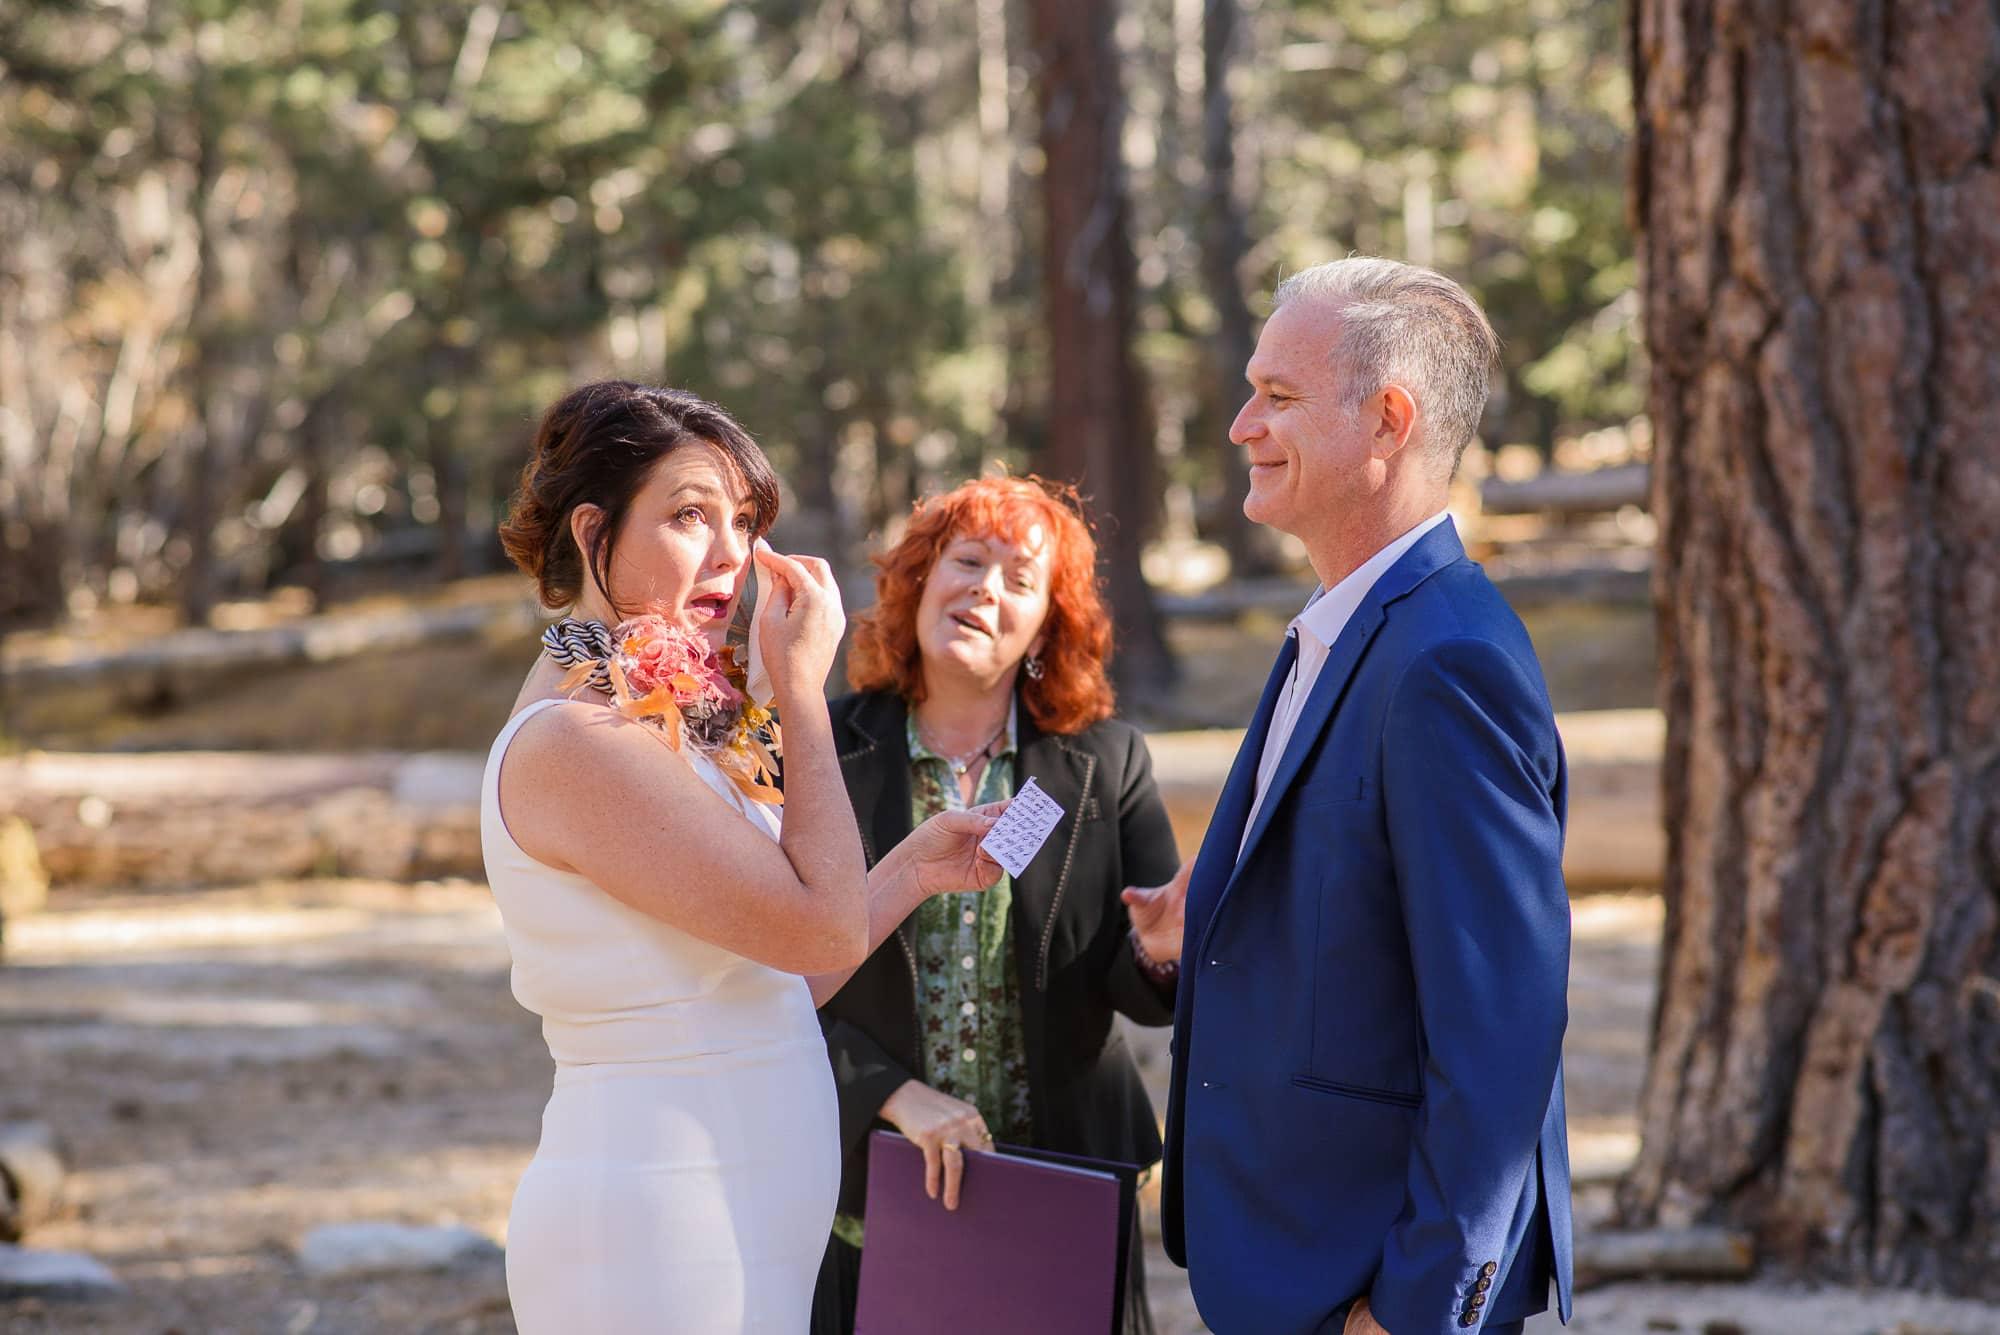 017_Alan_and_Heidi_Palm_Springs_Tram_Wedding